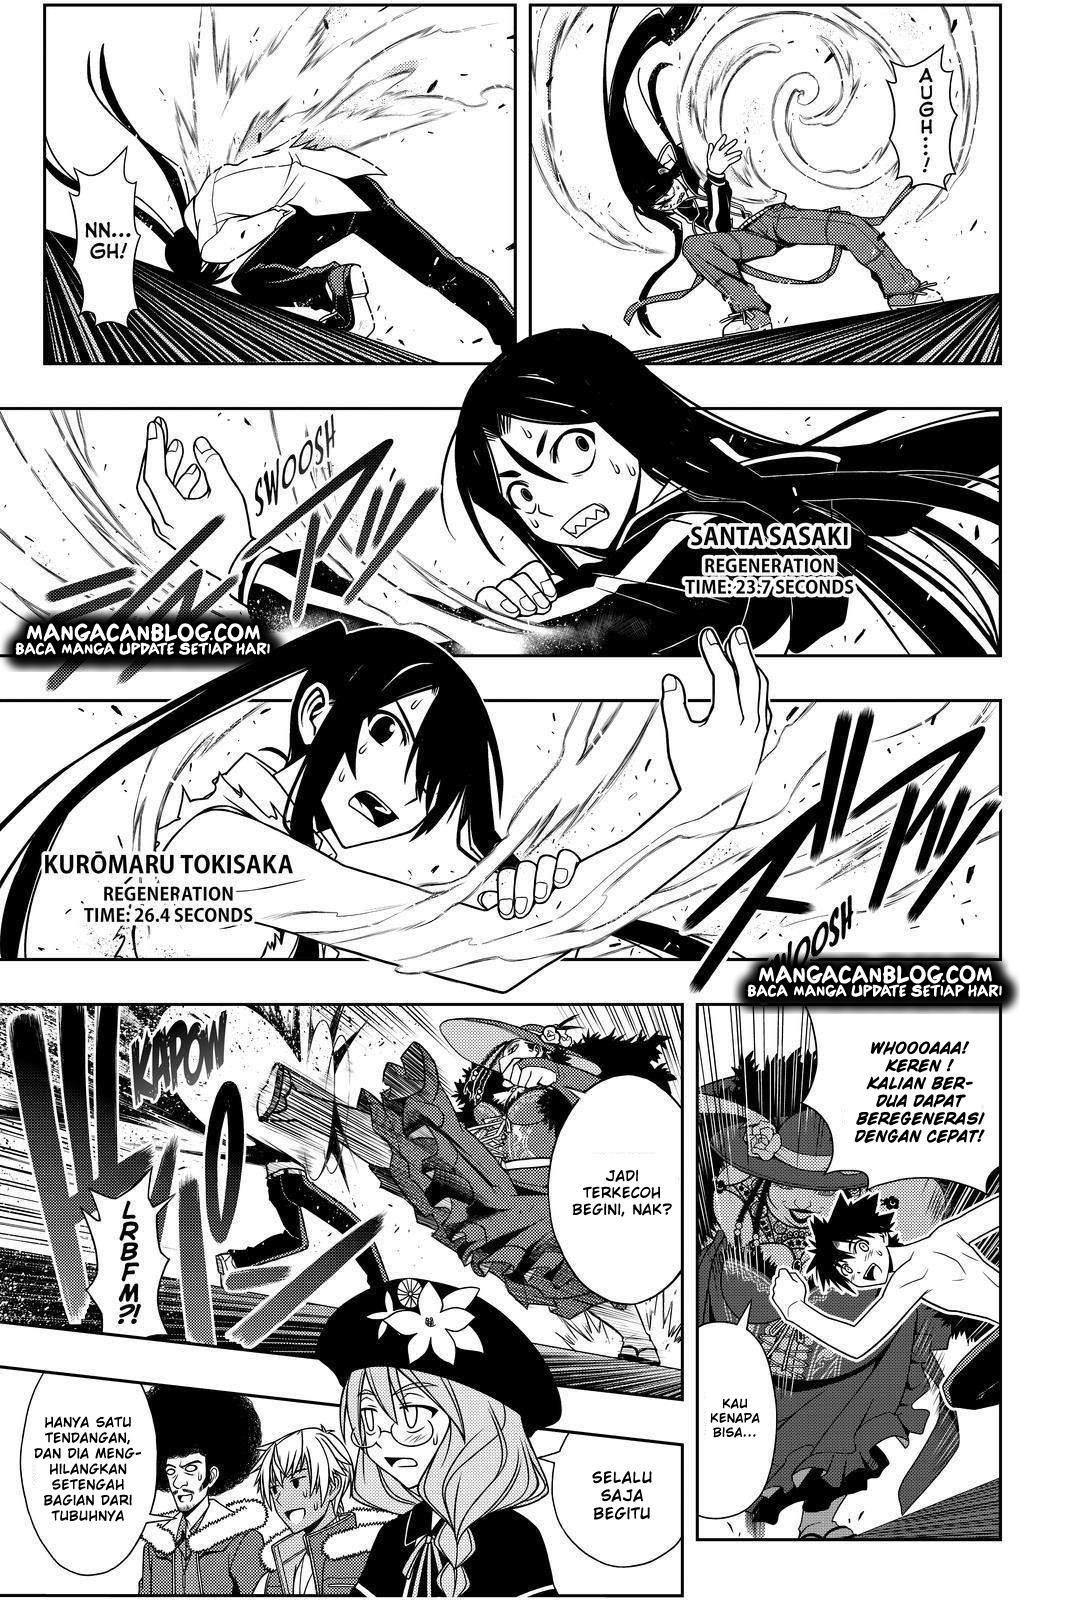 Komik uq holder 082 - semuanya sulit 83 Indonesia uq holder 082 - semuanya sulit Terbaru 9|Baca Manga Komik Indonesia